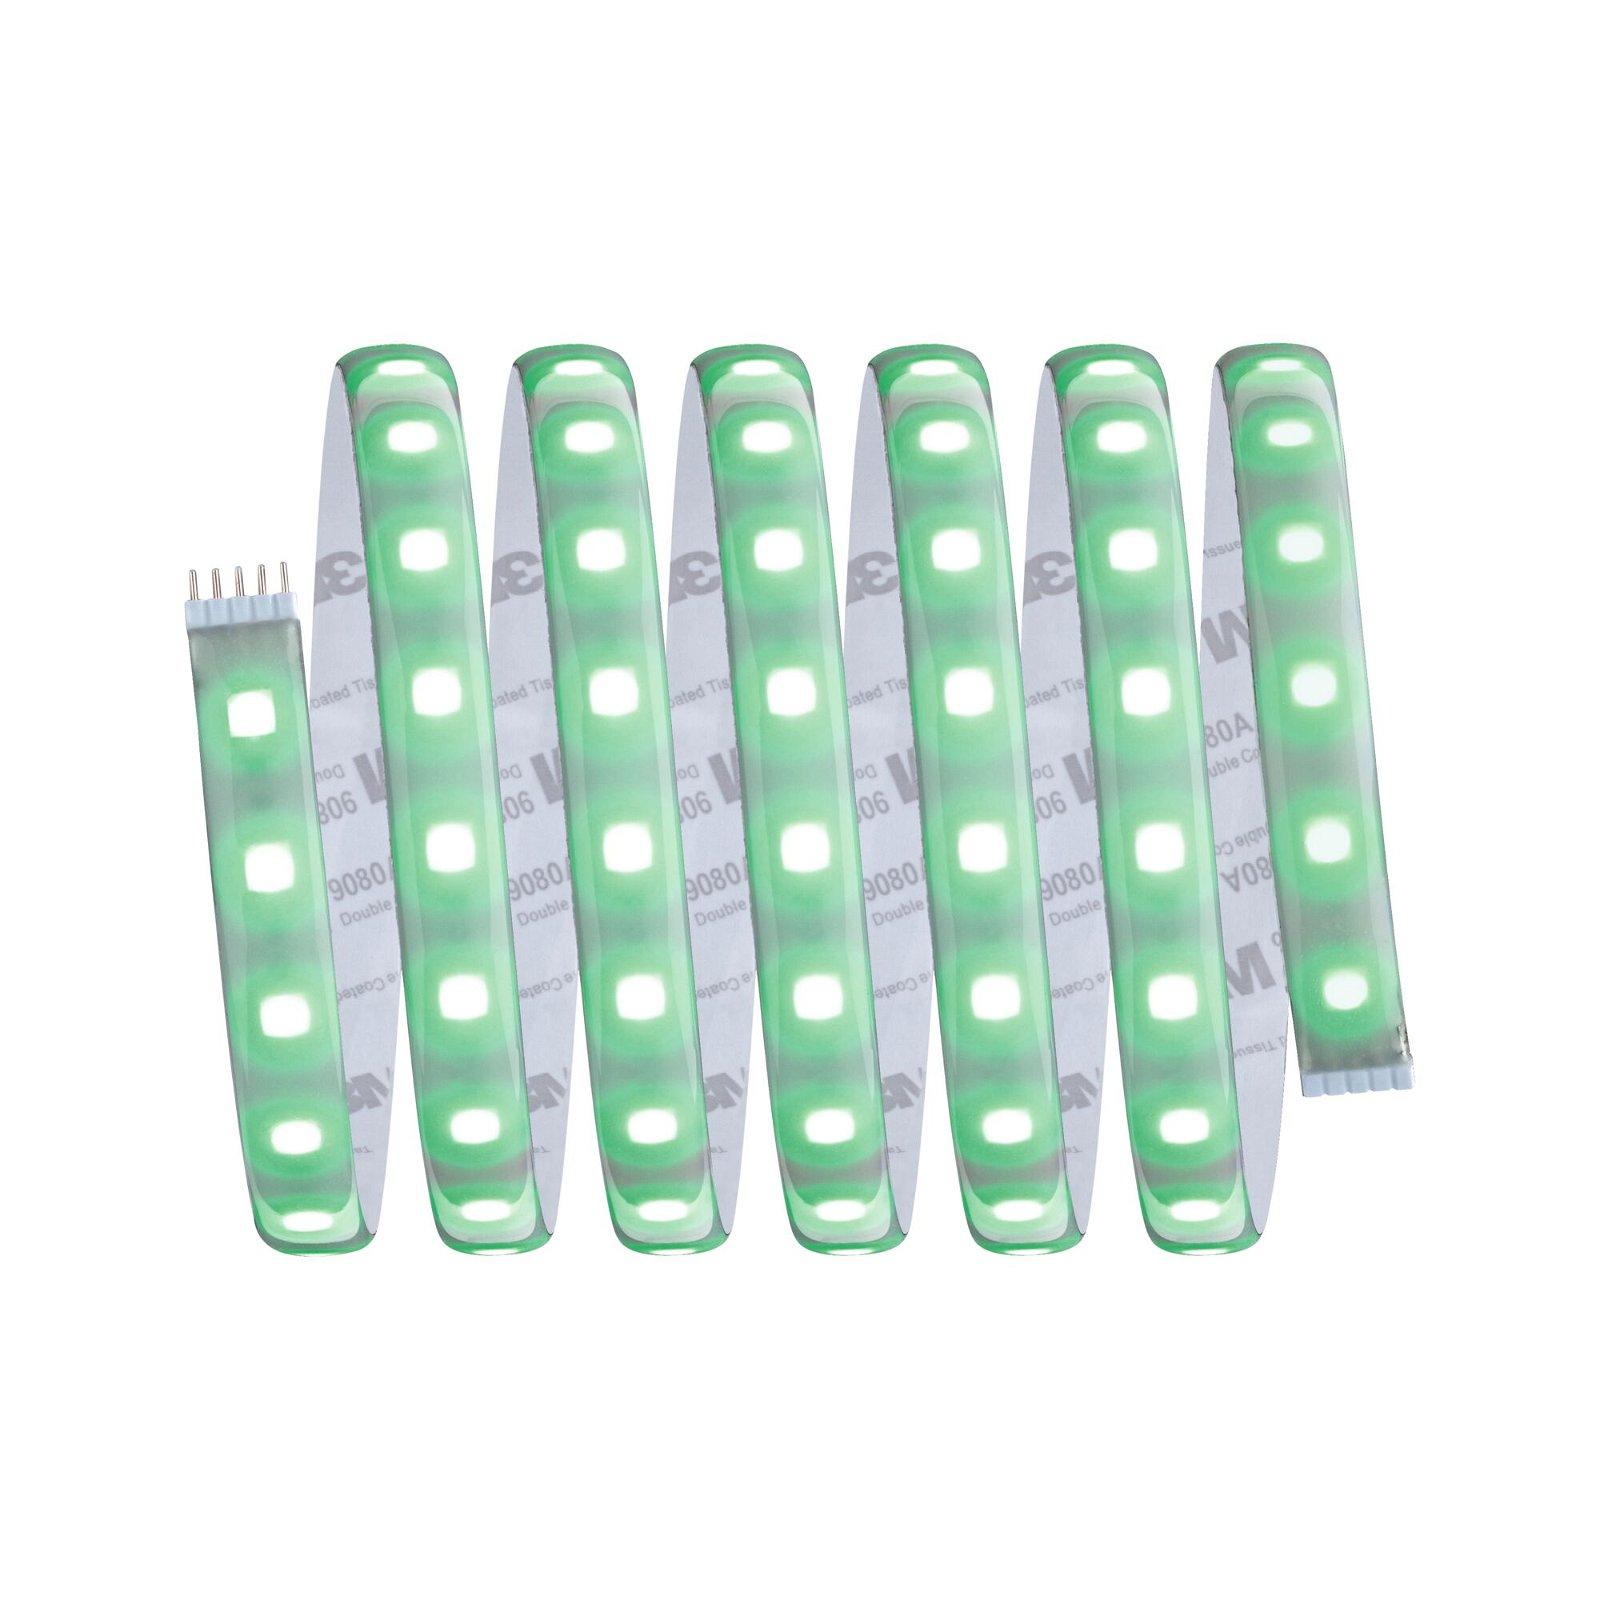 MaxLED 500 Strip LED RGBW 2,5m 30W 1250lm RGBW